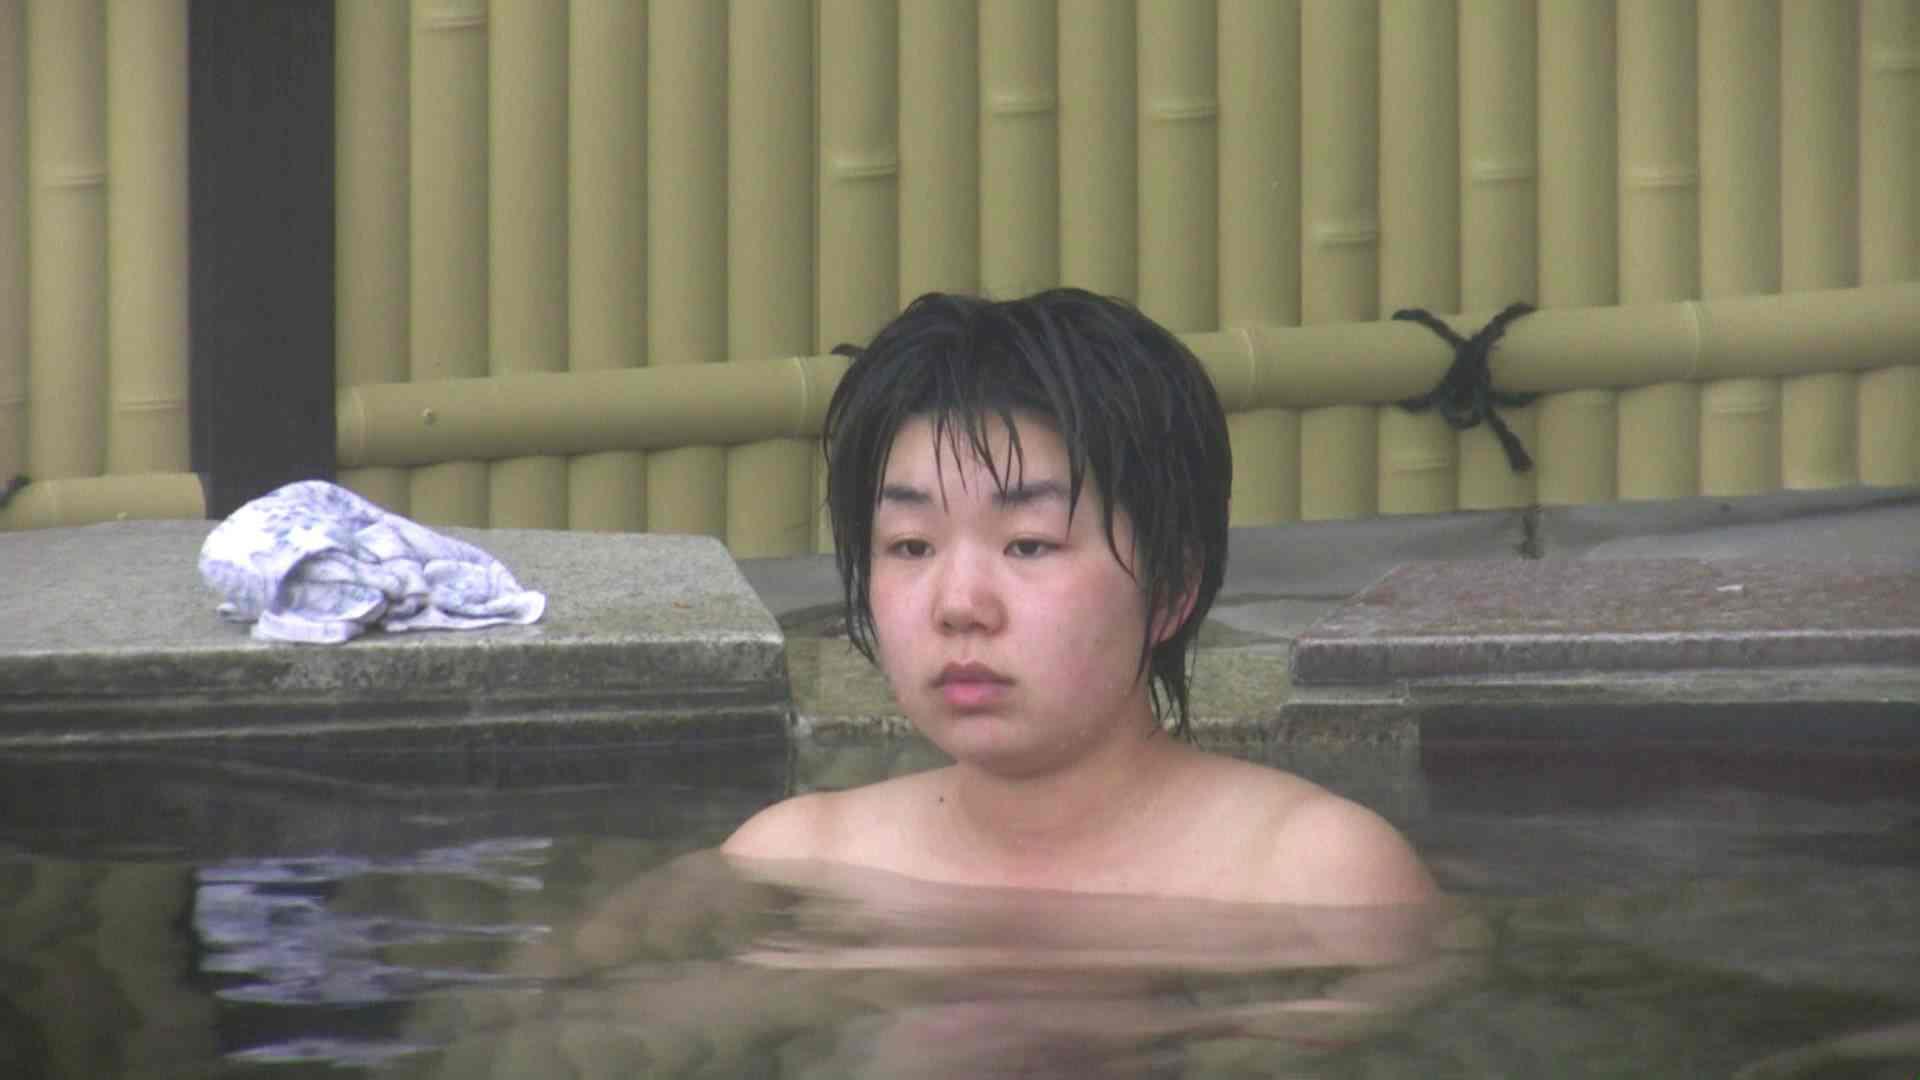 Aquaな露天風呂Vol.53【VIP限定】 露天風呂編   盗撮シリーズ  76PIX 15